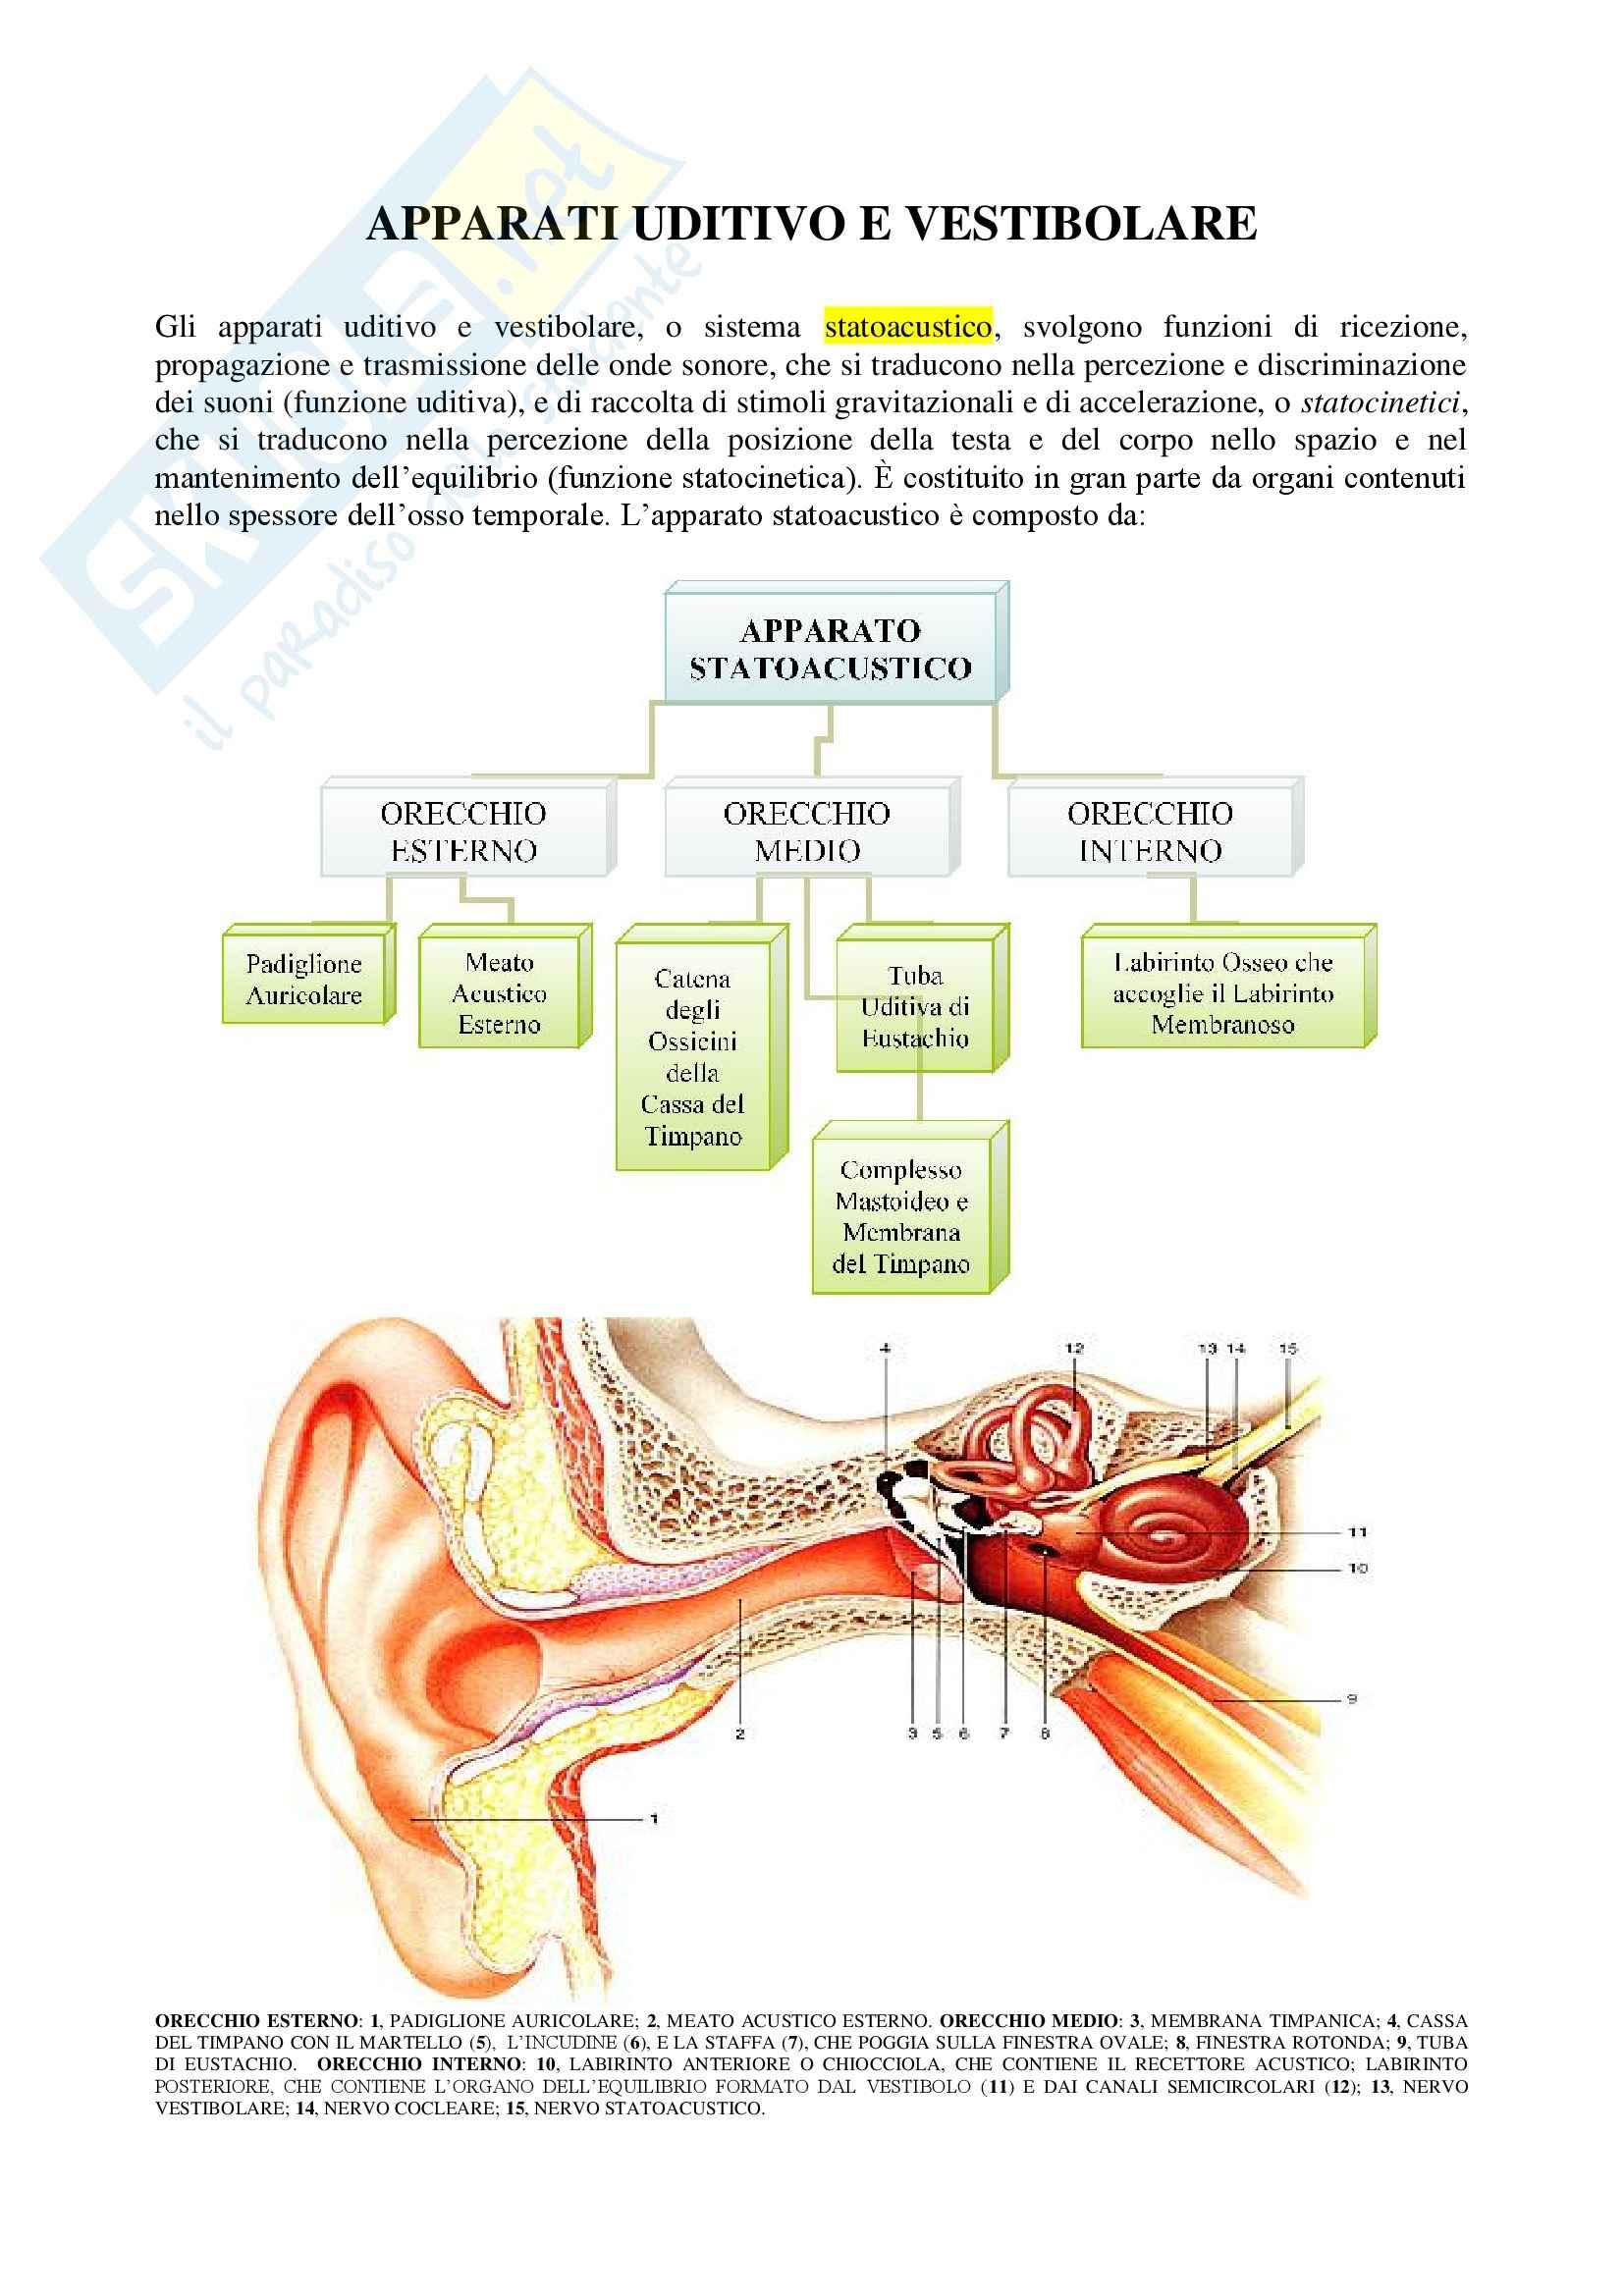 Anatomia umana - apparati uditivo e vestibolare